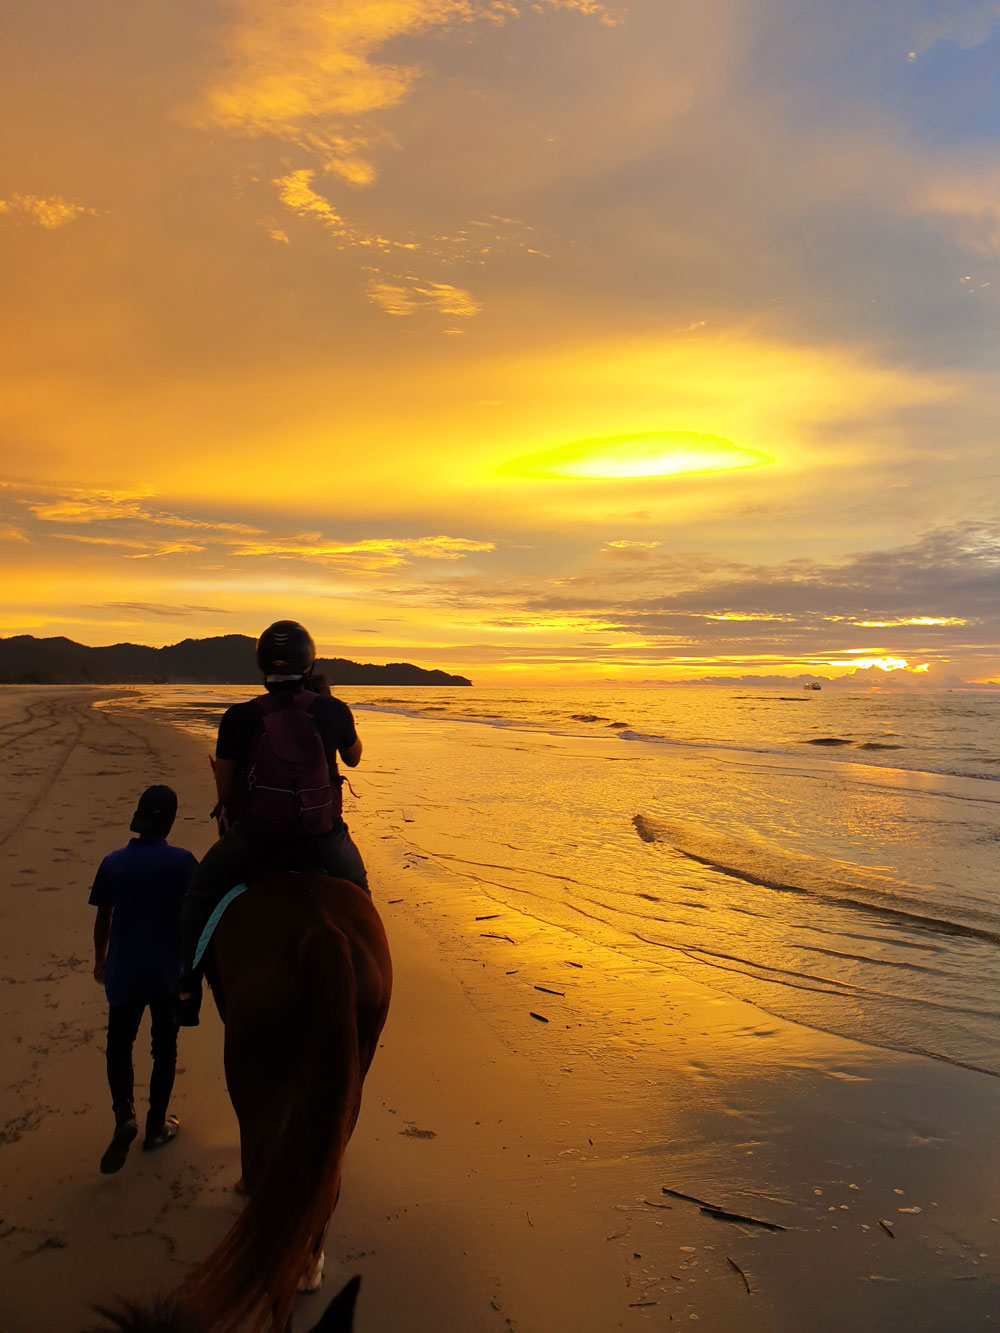 shangrila_rasaria_sunset.jpg